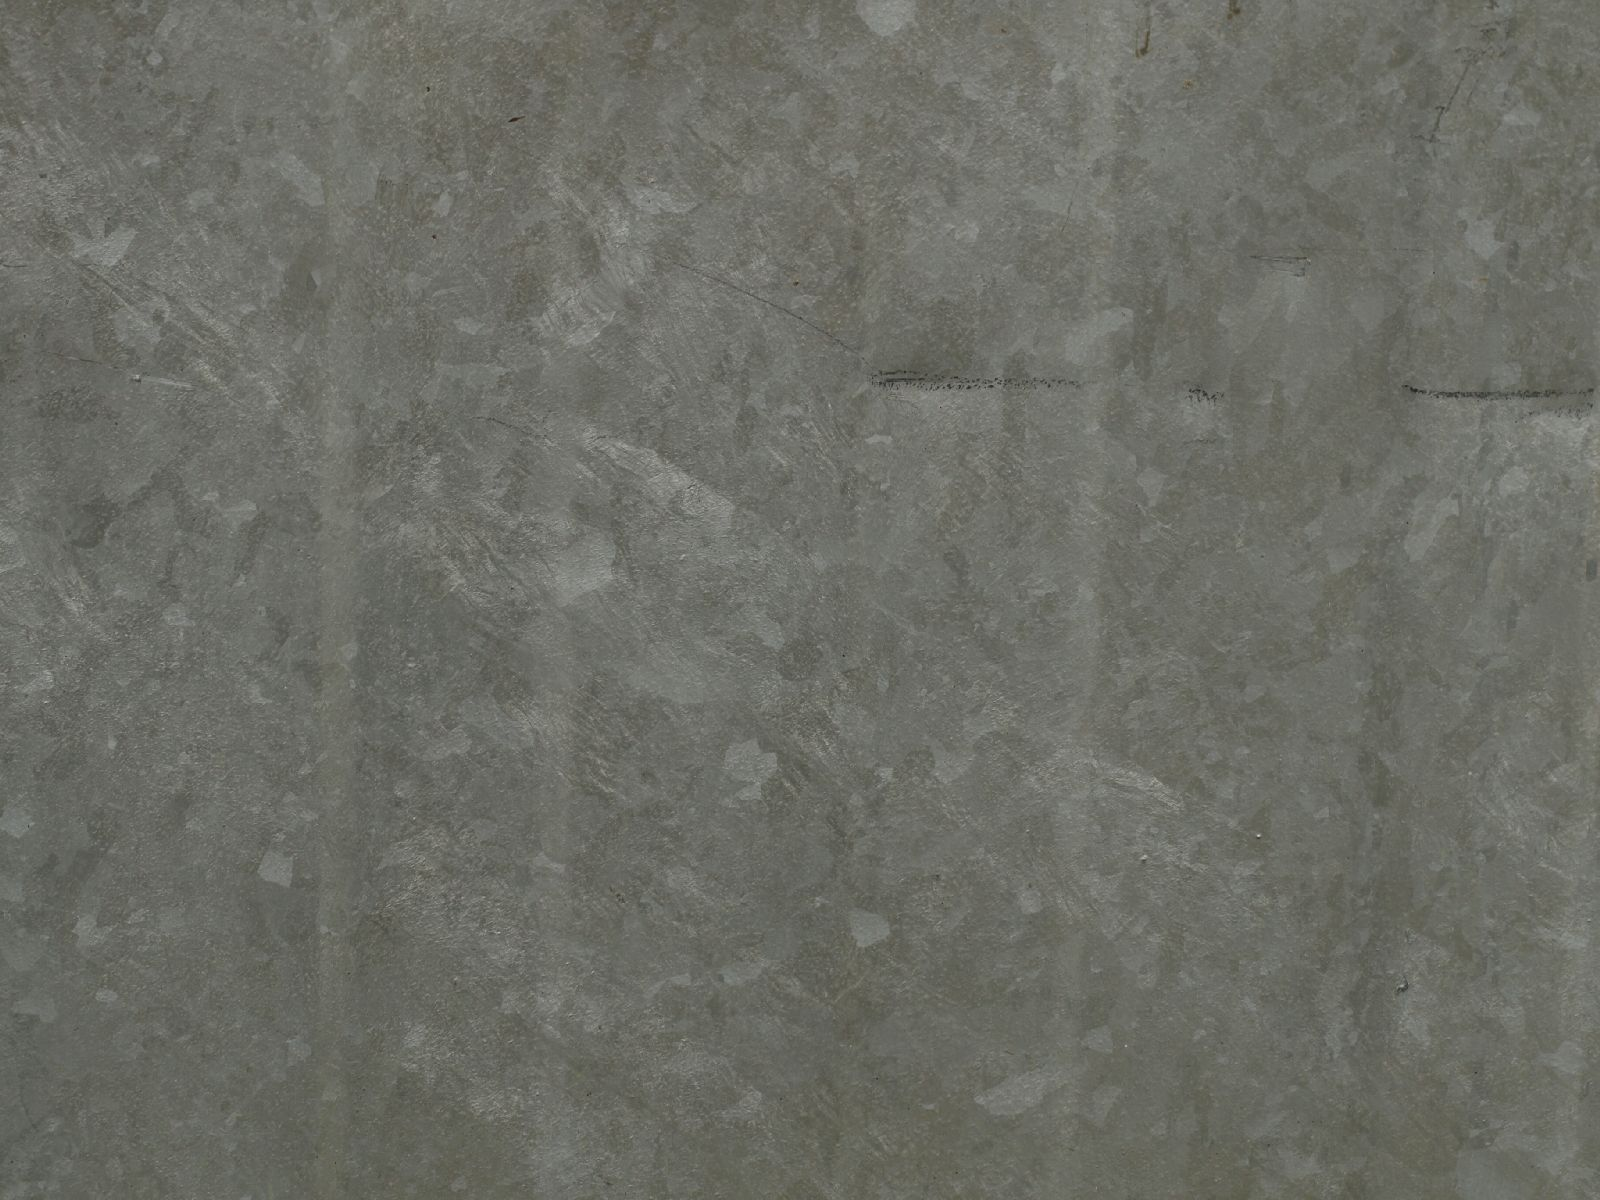 Metall_Textur_A_P4131144